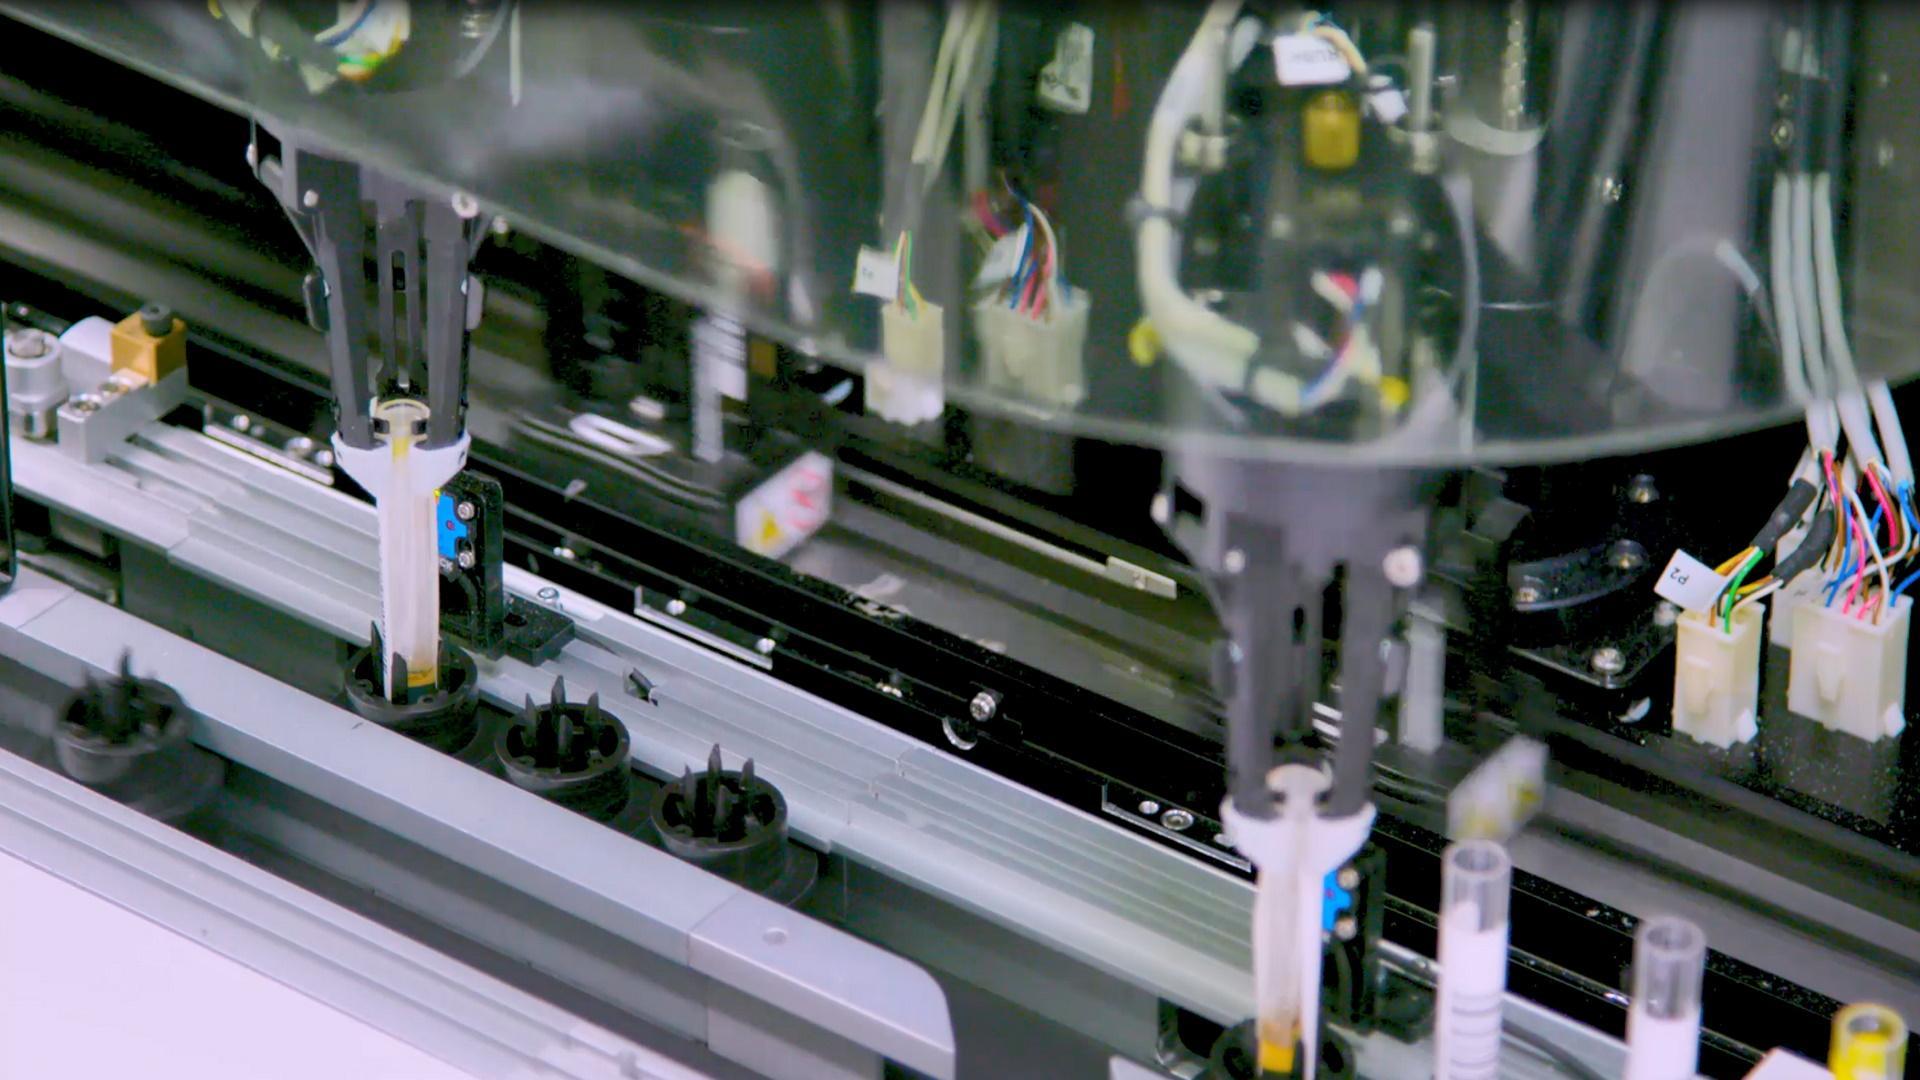 Laboratoire Olivot-Mariotti - Siemens Healthineers